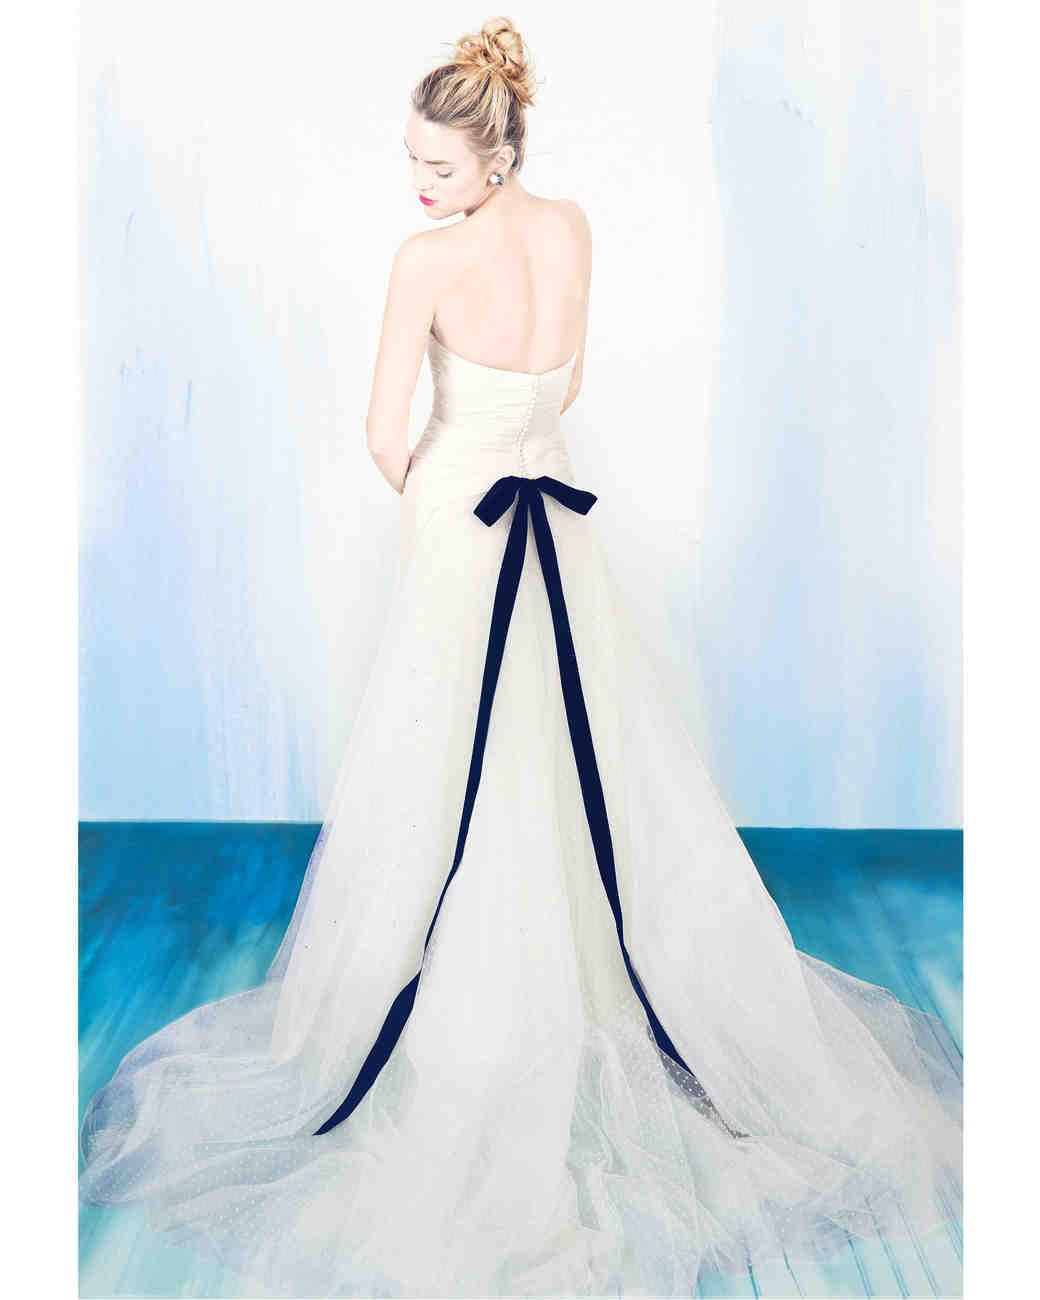 moscar-de-la-renta-ball-gown-ribbon-50-d112700.jpg